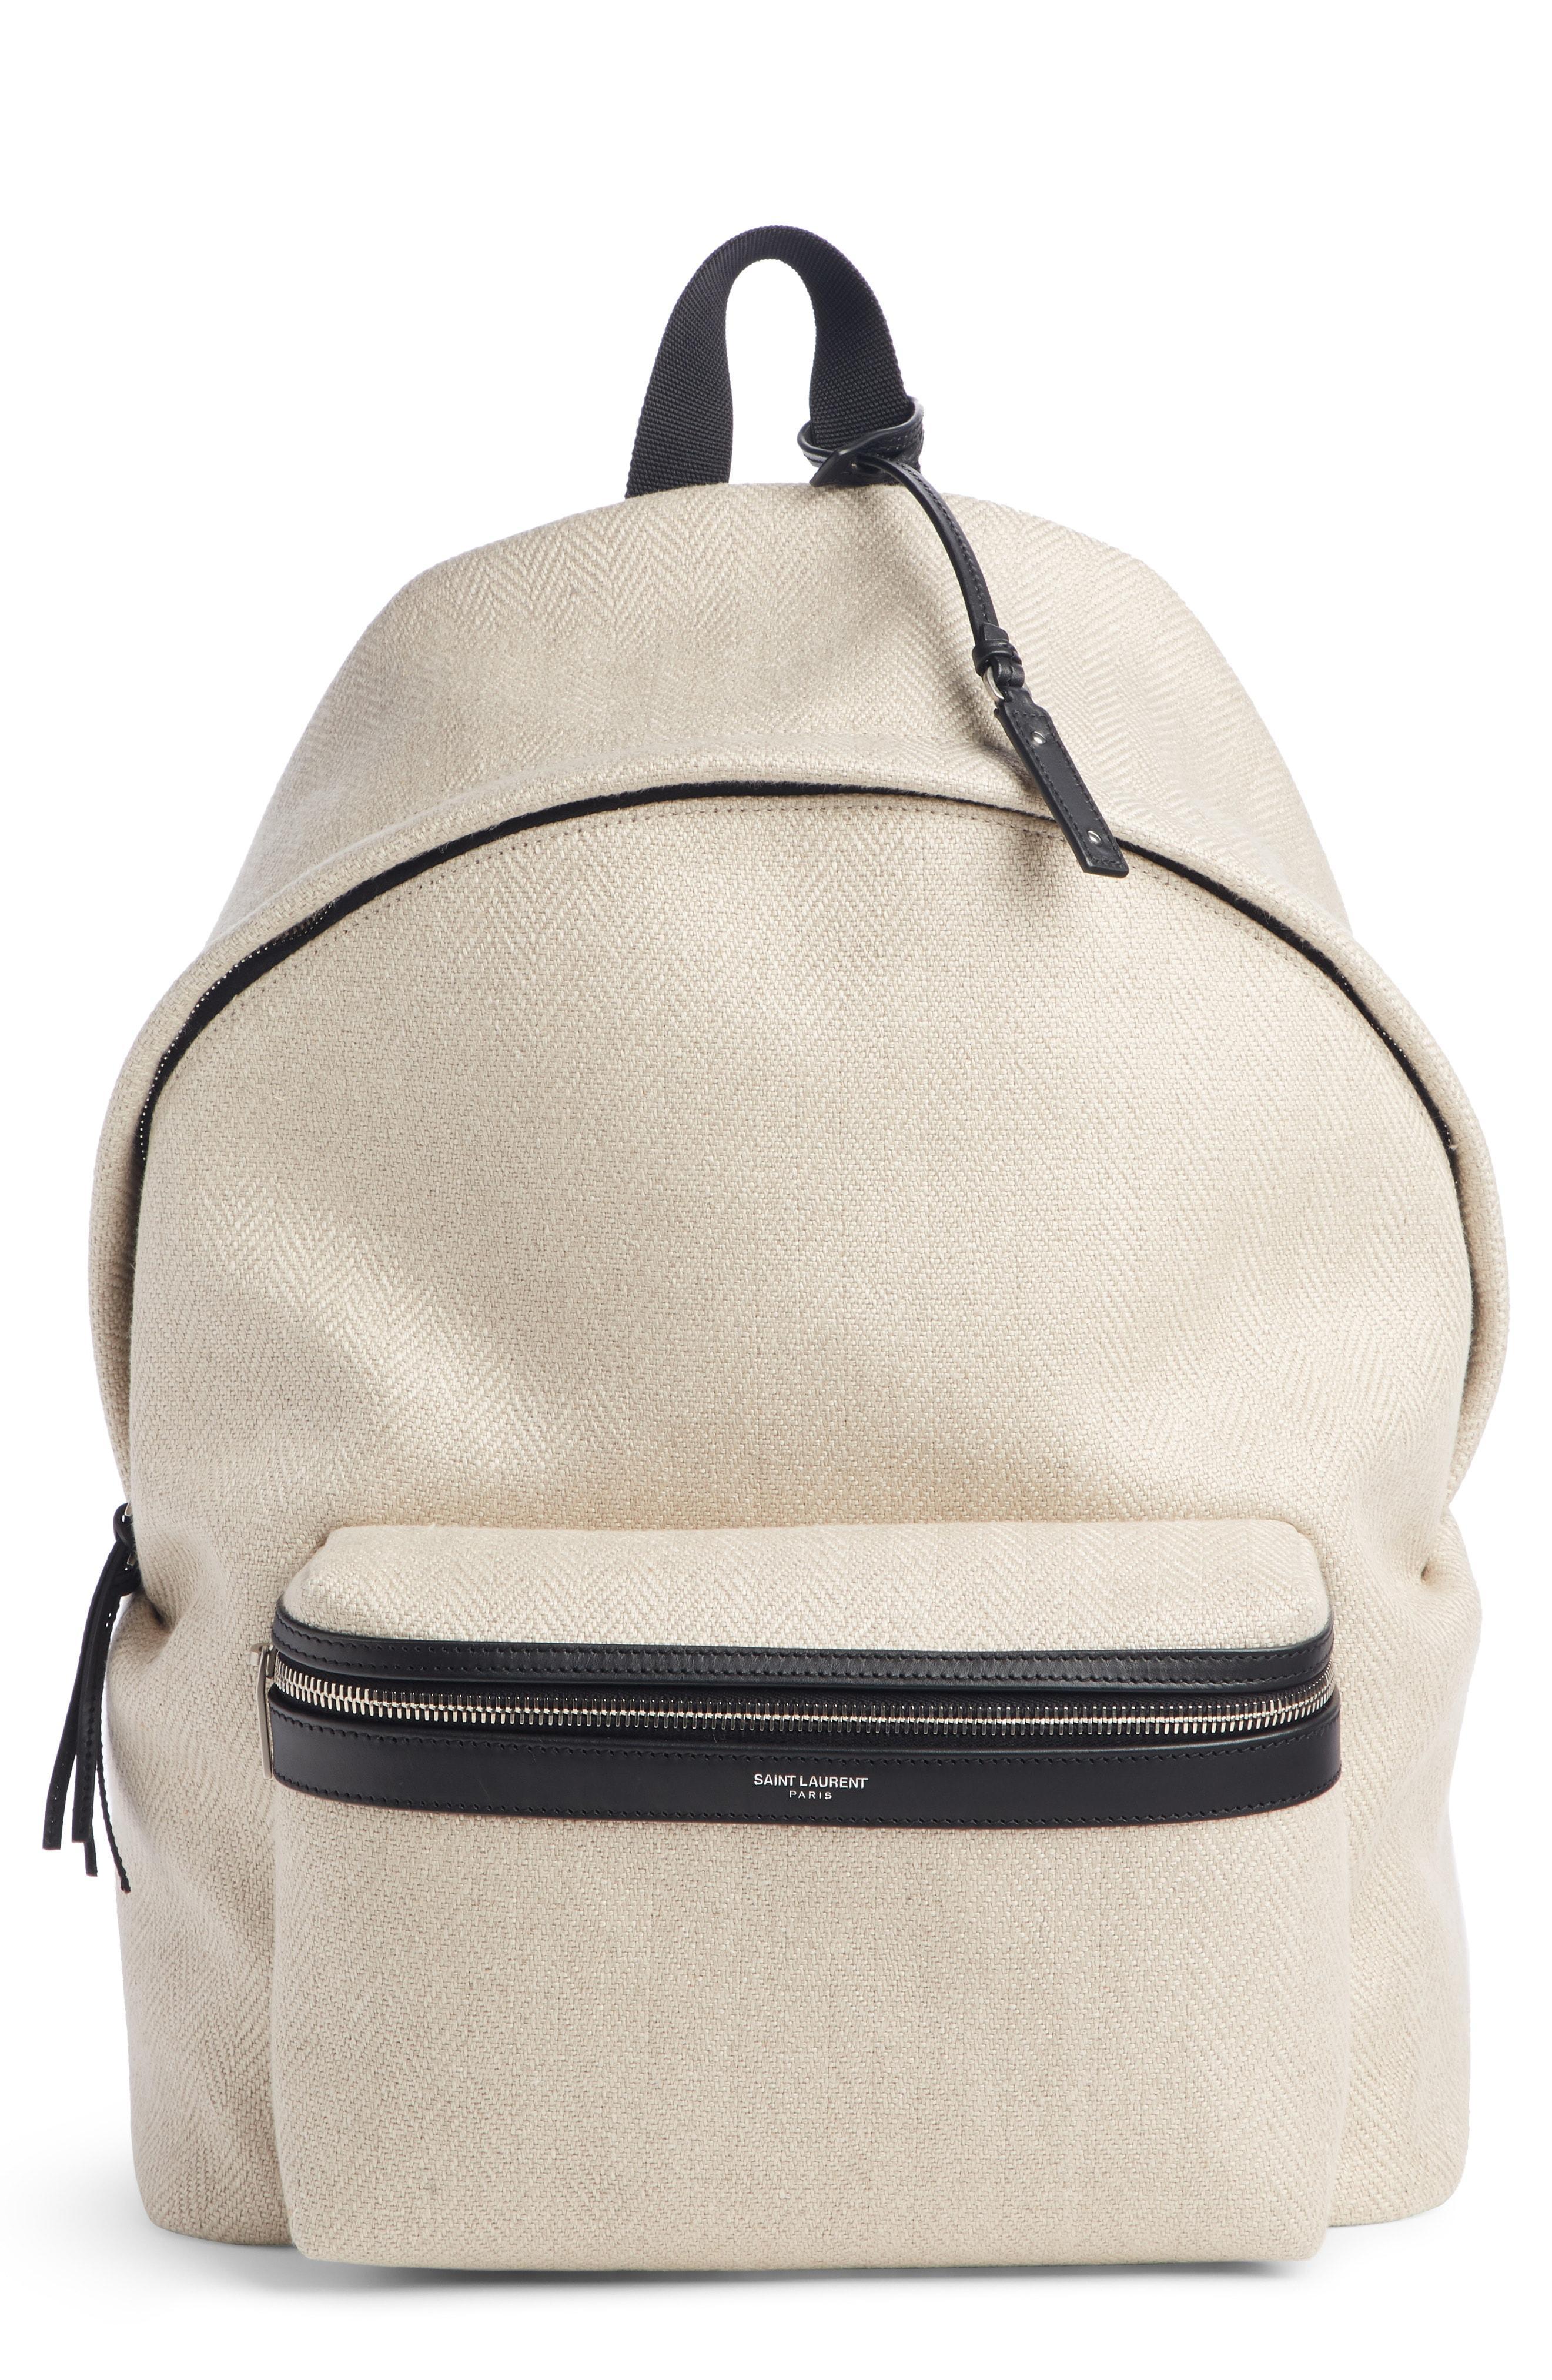 2bc408a8f Lyst - Saint Laurent City Herringbone Linen Backpack in Natural for Men